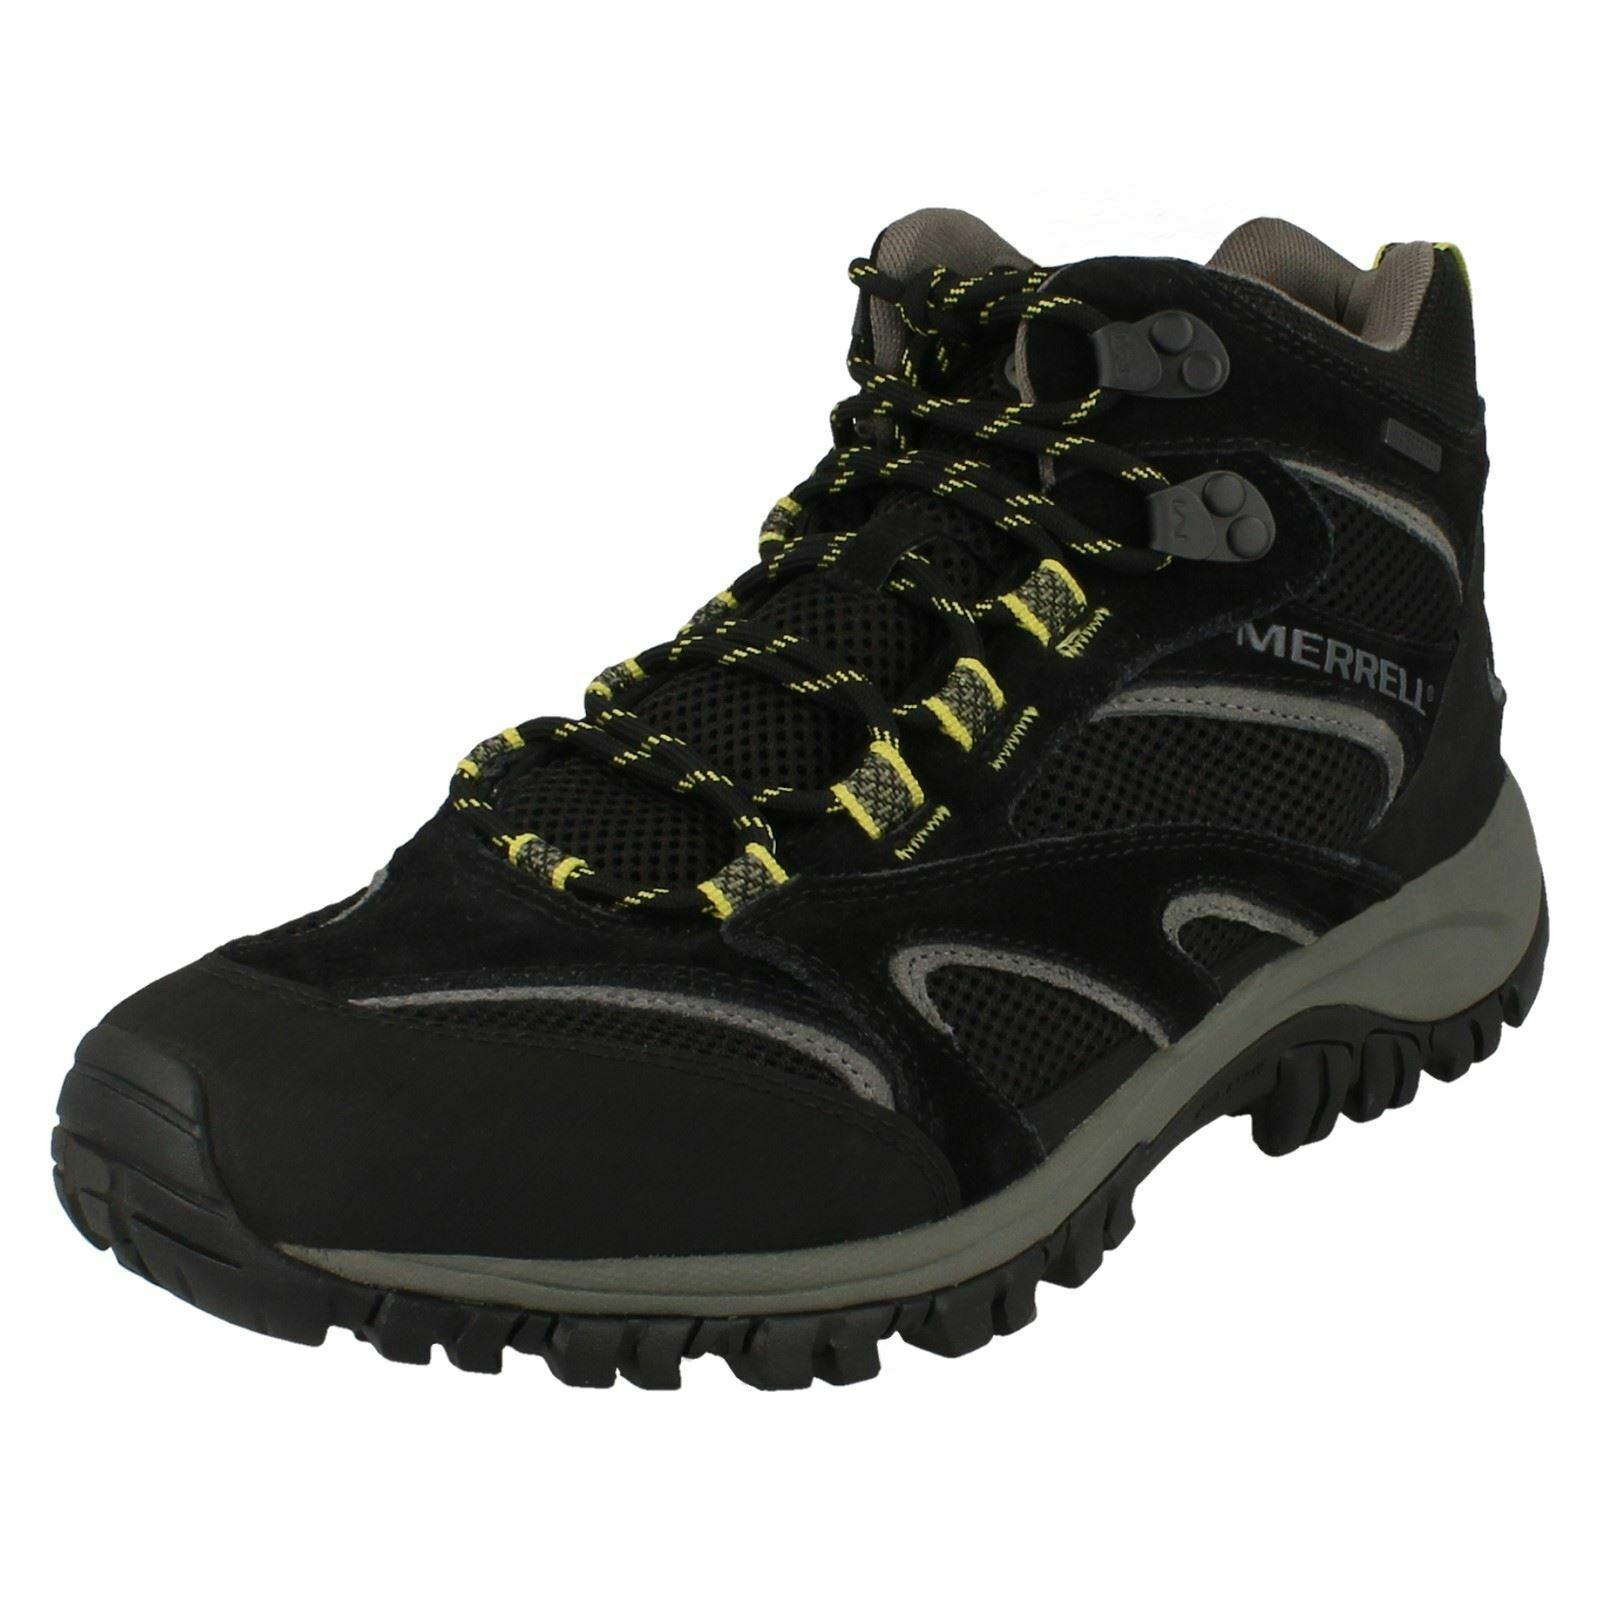 Mens Merrell Phoenix Mid Waterproof Walking Boots